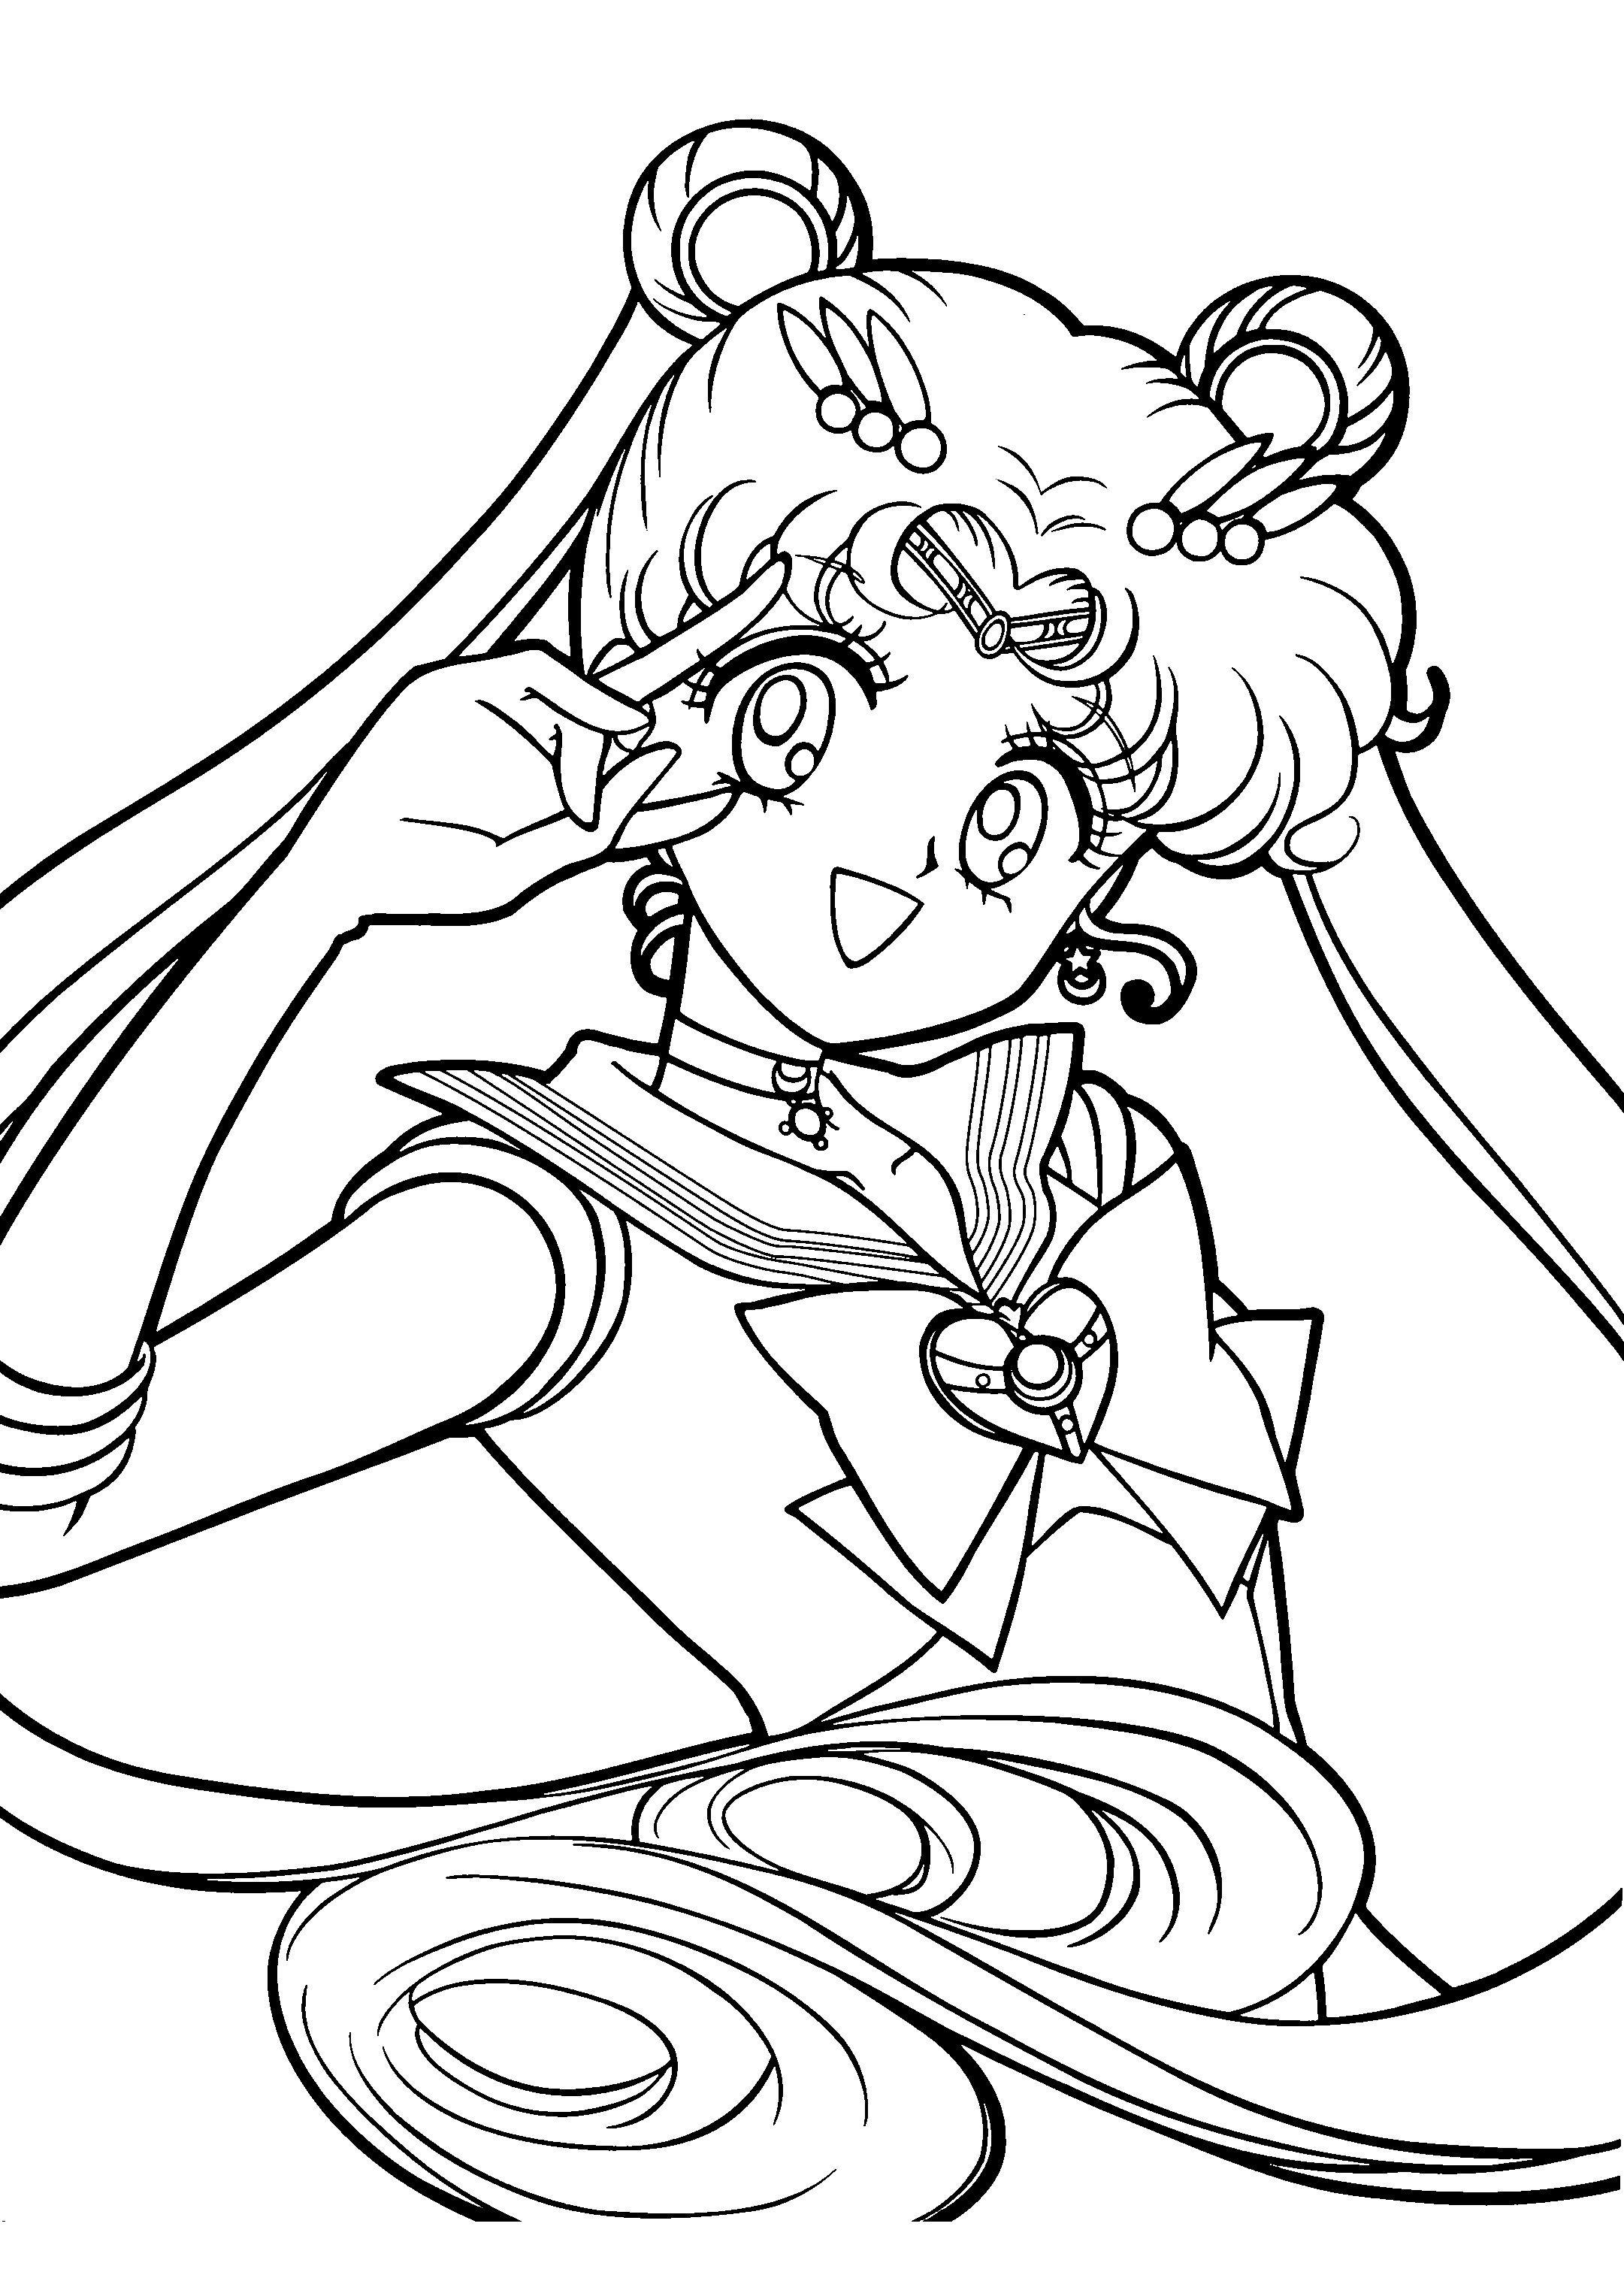 Sailor Moon Coloring Page // #sailormoon | Sailor Moon | Pinterest ...